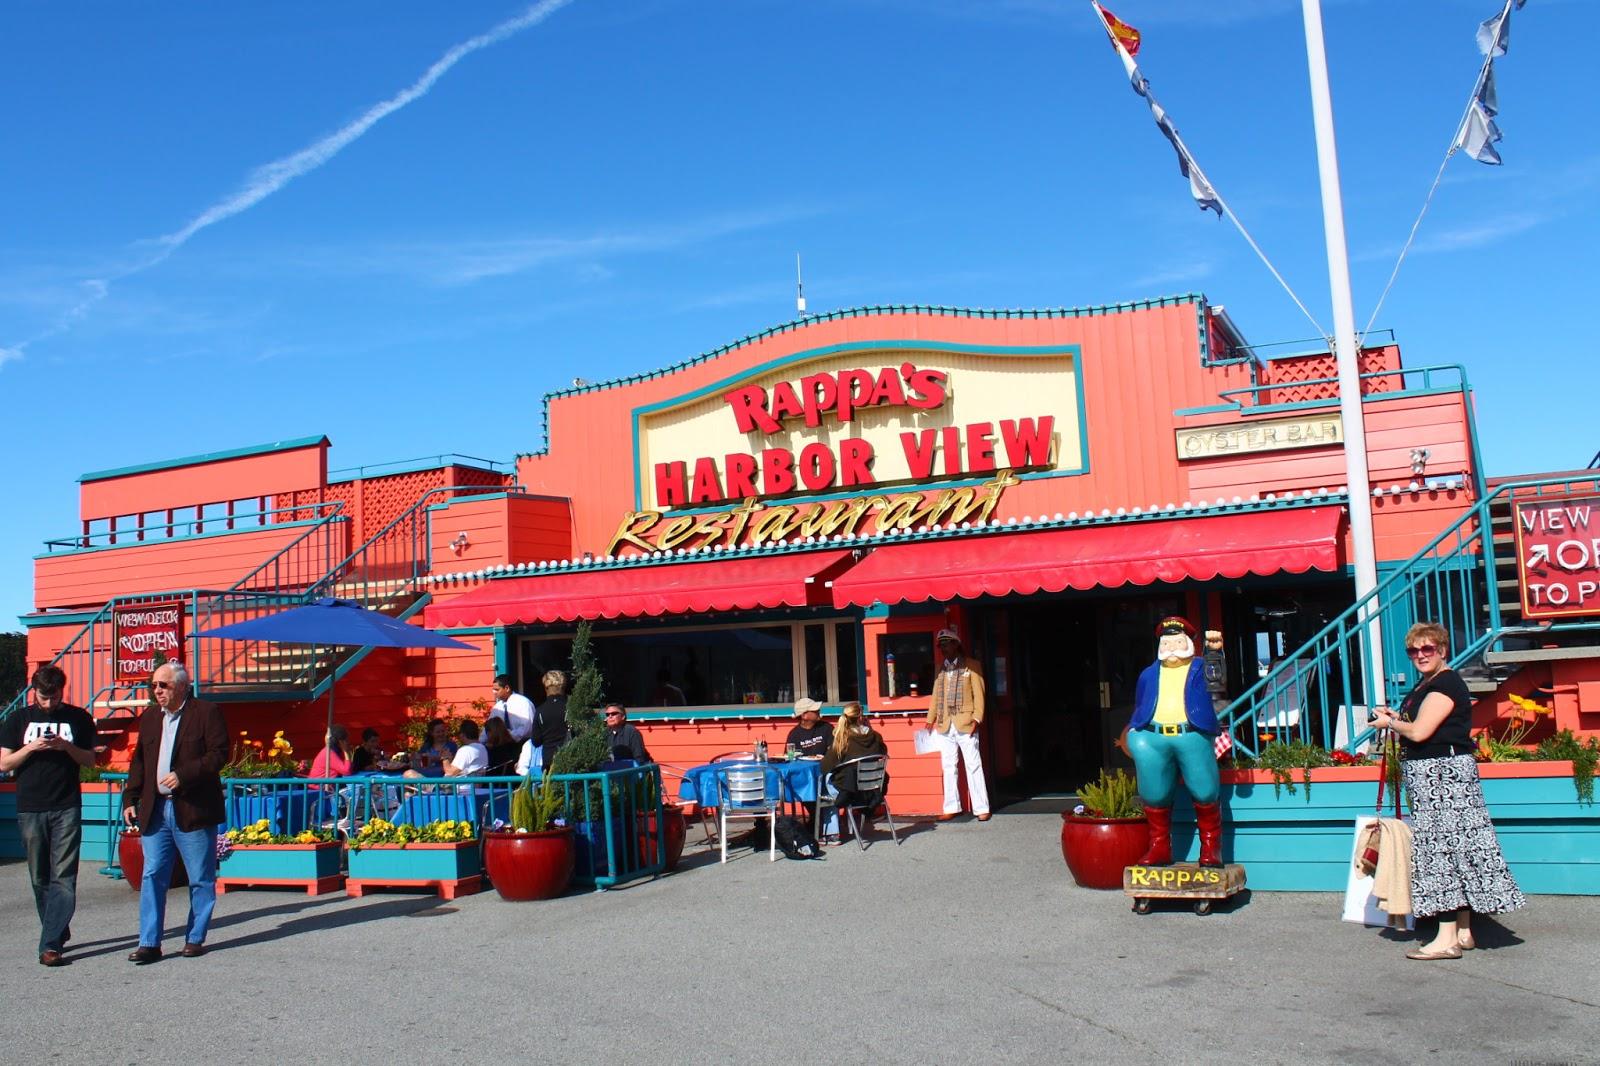 Monterey bay wharf restaurants confirm. All